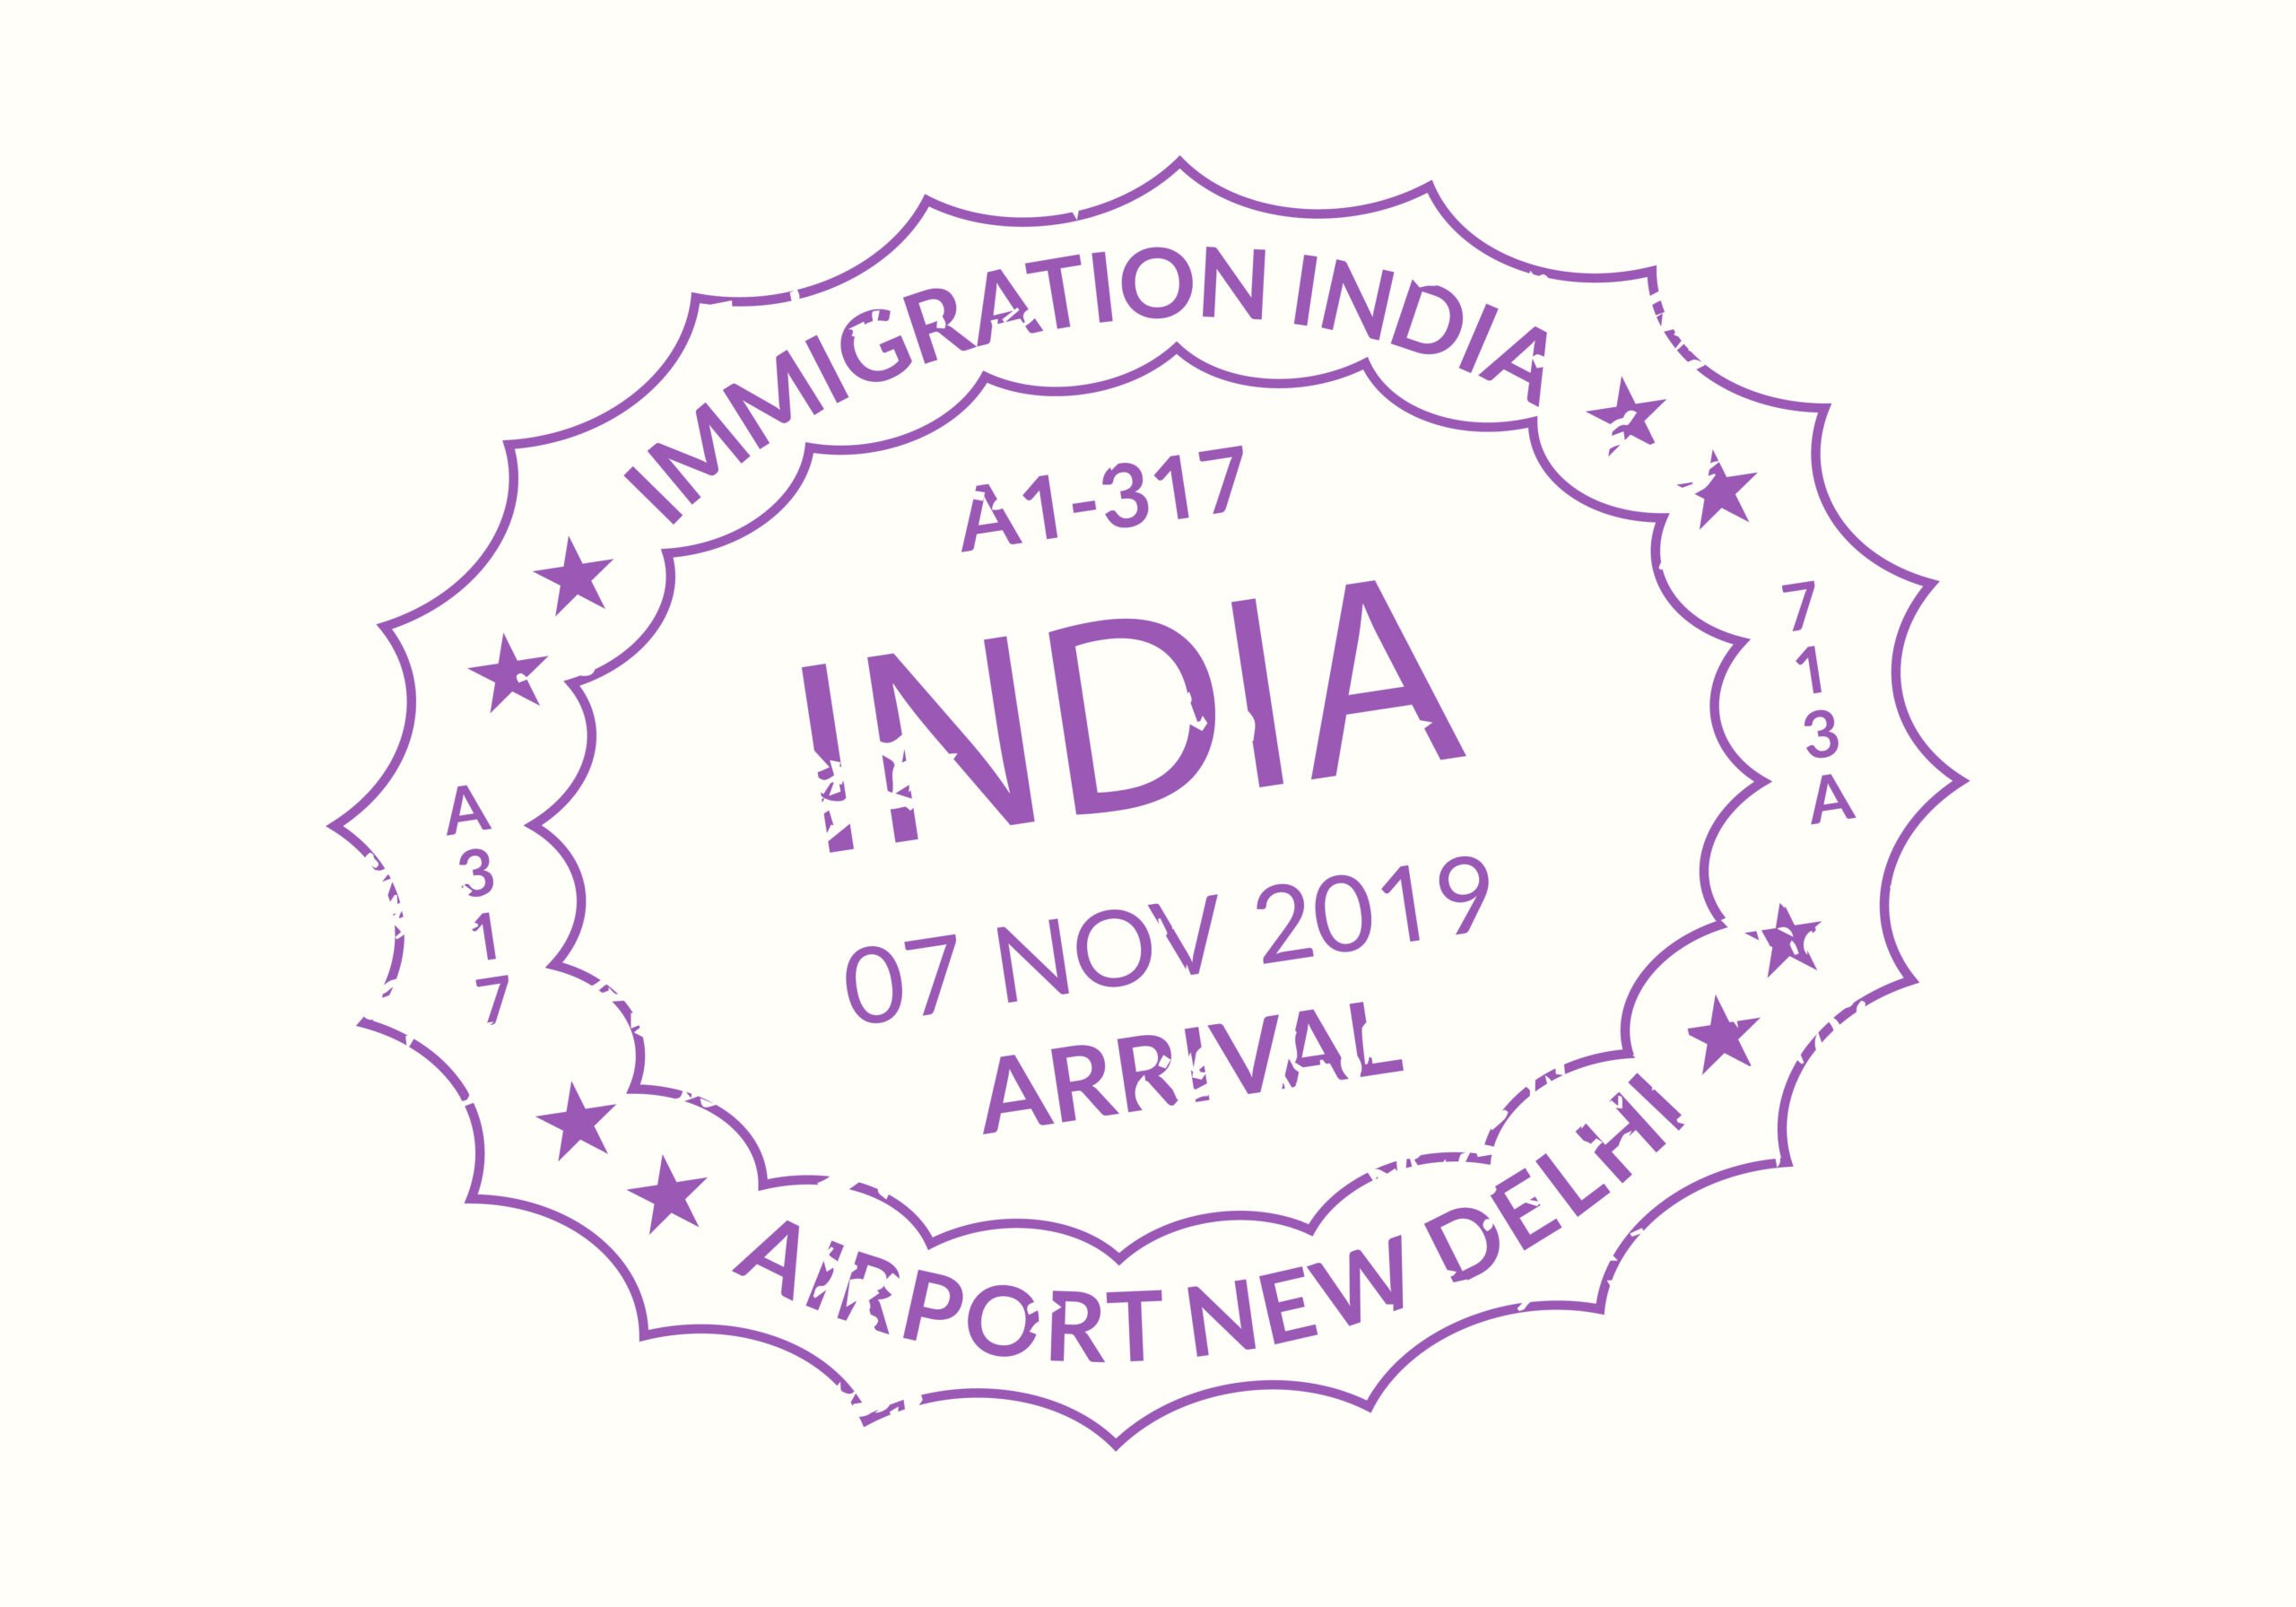 Who needs a visa to visit India